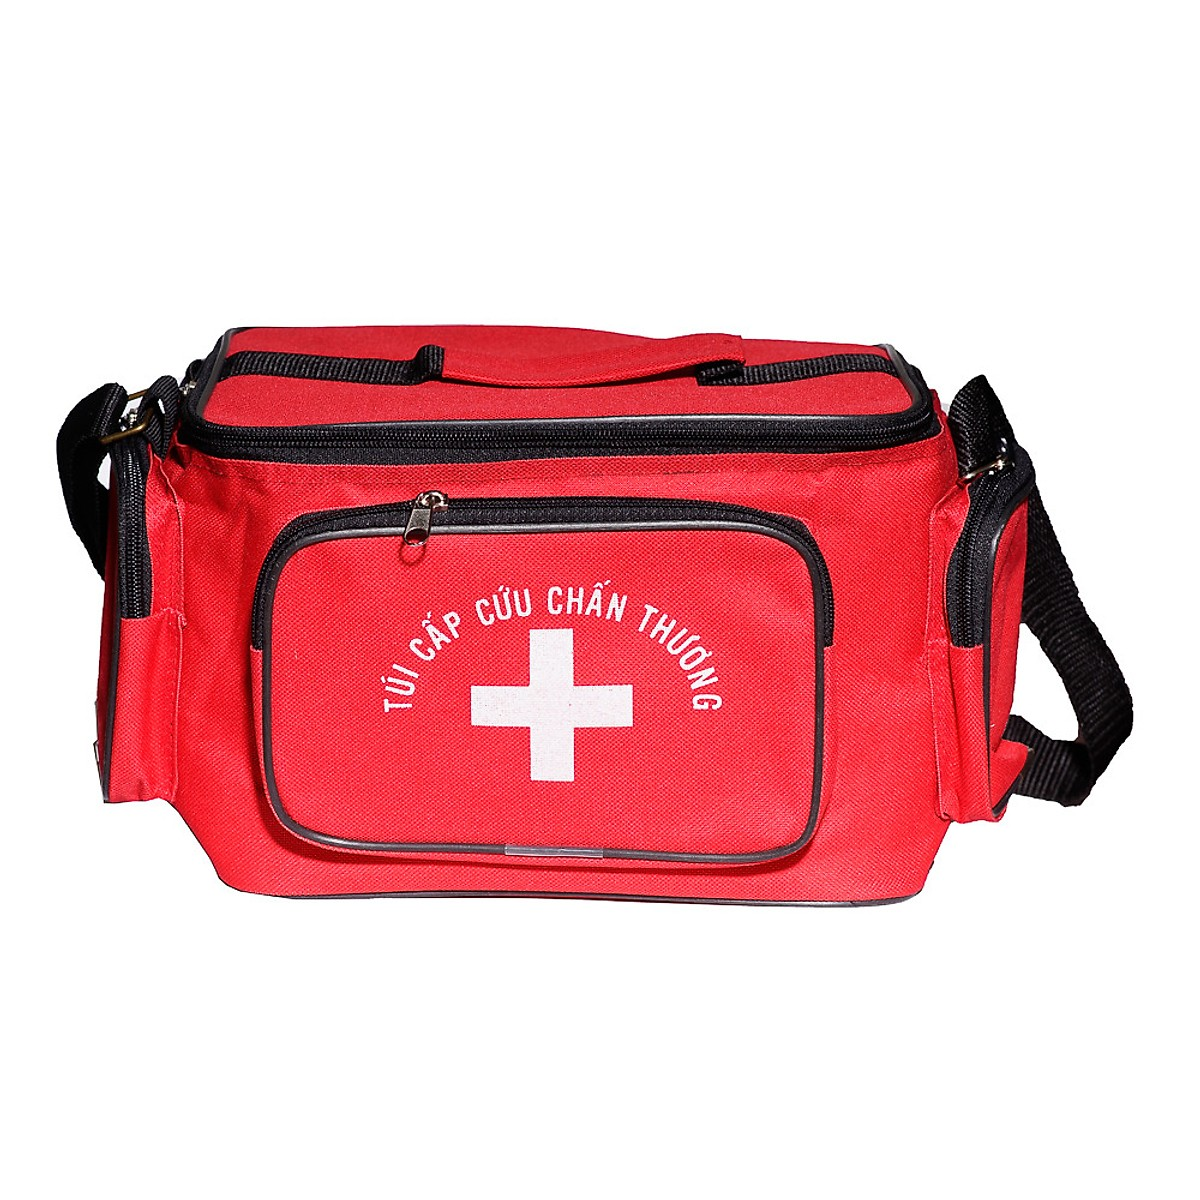 Túi y tế đỏ size S